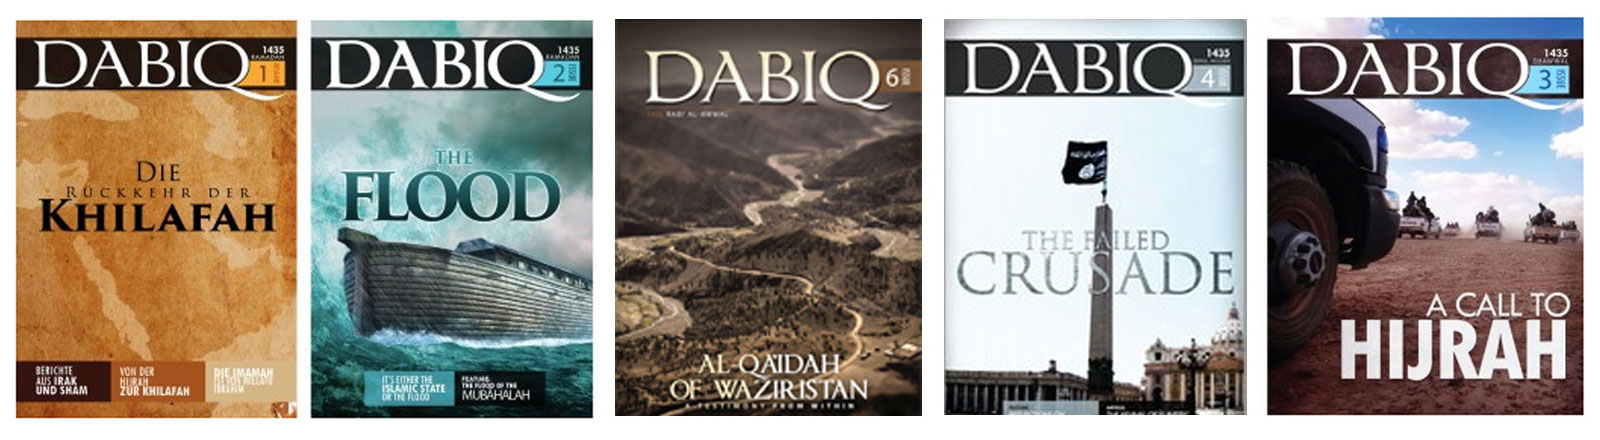 Screenshot des IS-Propaganda-Magazins Dabiq